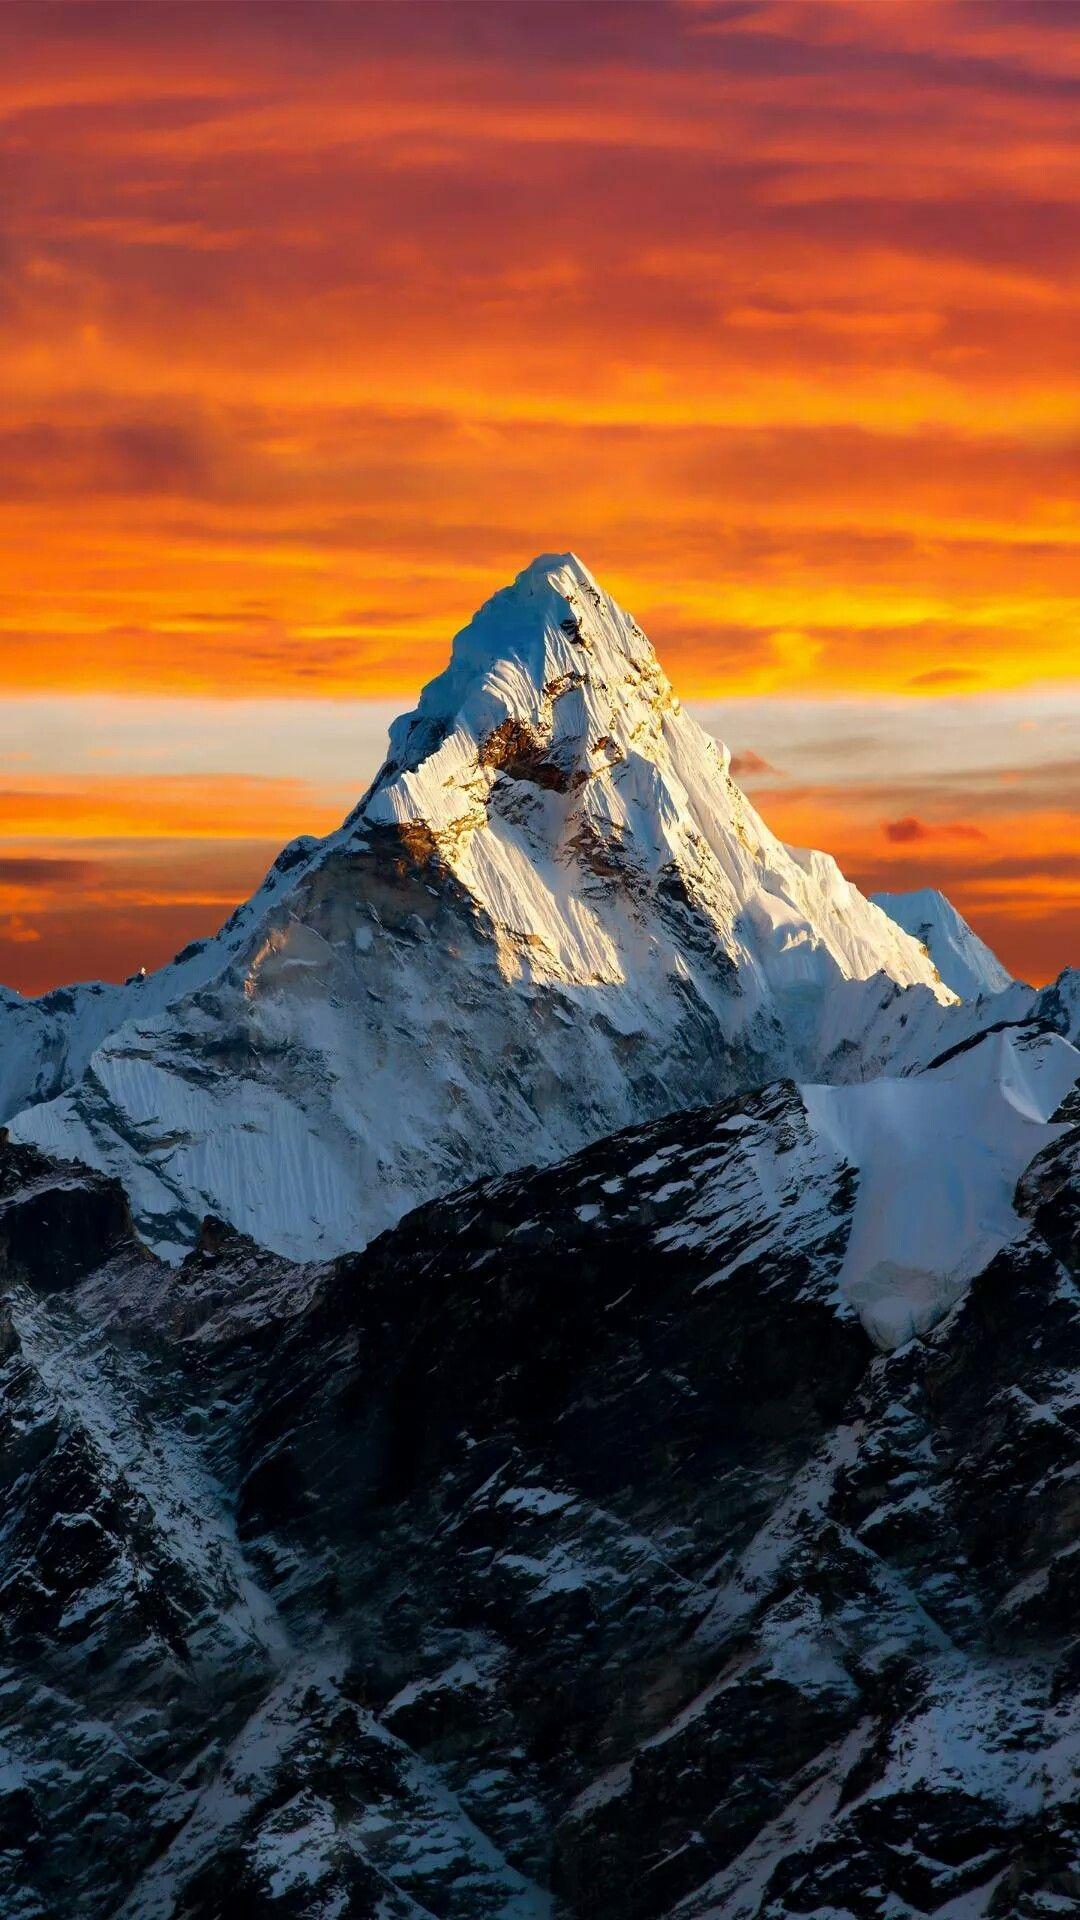 Snowy Mountain Under Sunset Landscape Wallpaper Beautiful Landscapes Landscape Photography